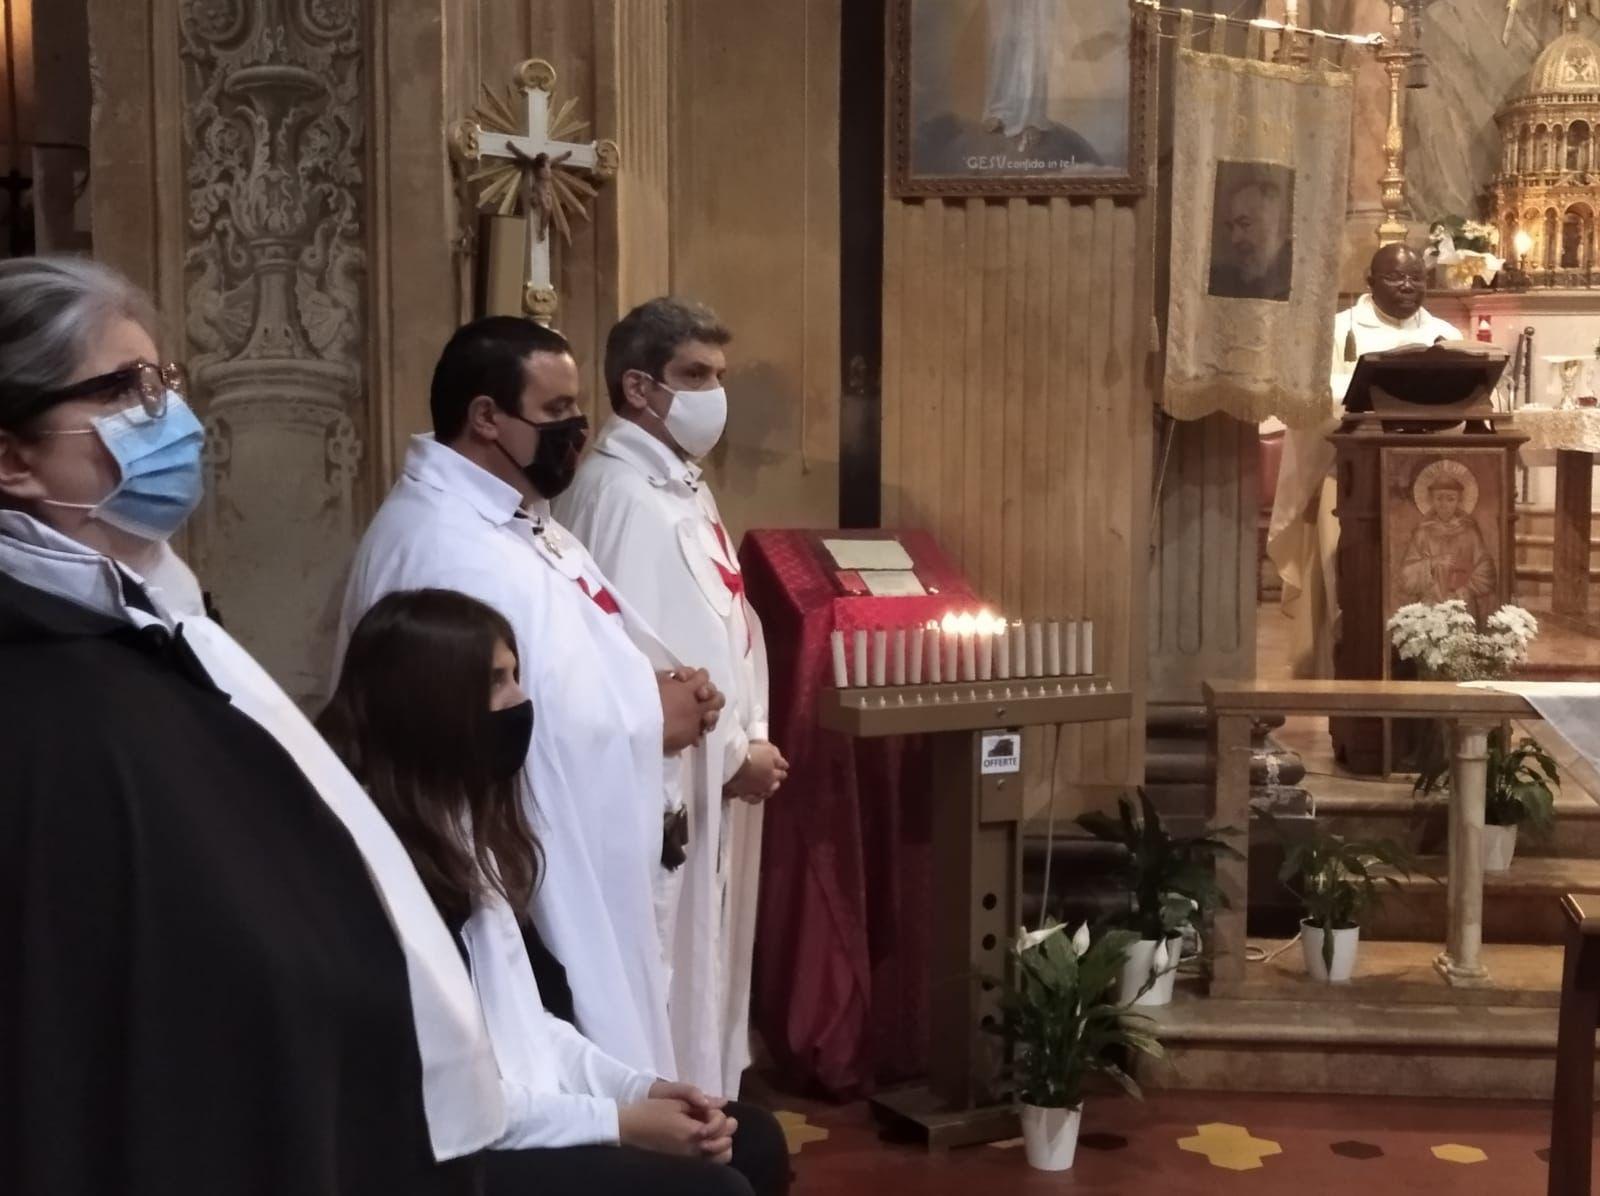 Teilnahme an der Heiligen Messe Kirche Santa Maria del Fiore – Forlì(FC) 23.04.2021